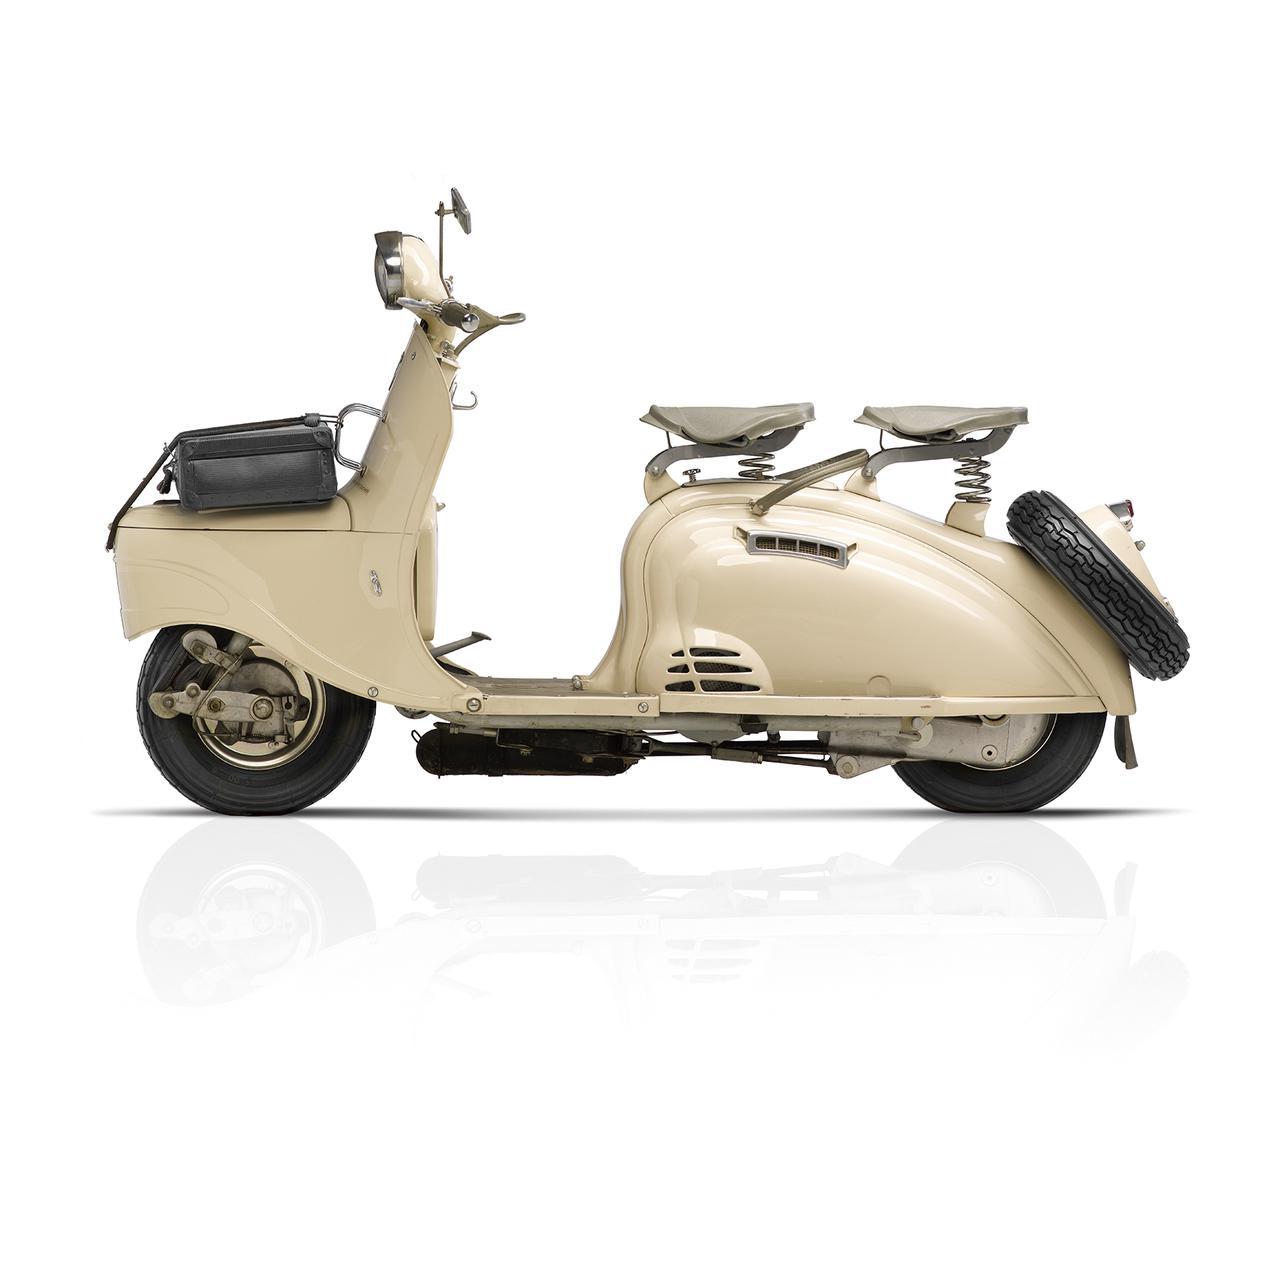 Images : 4番目の画像 - 「ジャンゴ 125 ABS 210周年リミテッドエディション」の写真を見る - LAWRENCE - Motorcycle x Cars + α = Your Life.